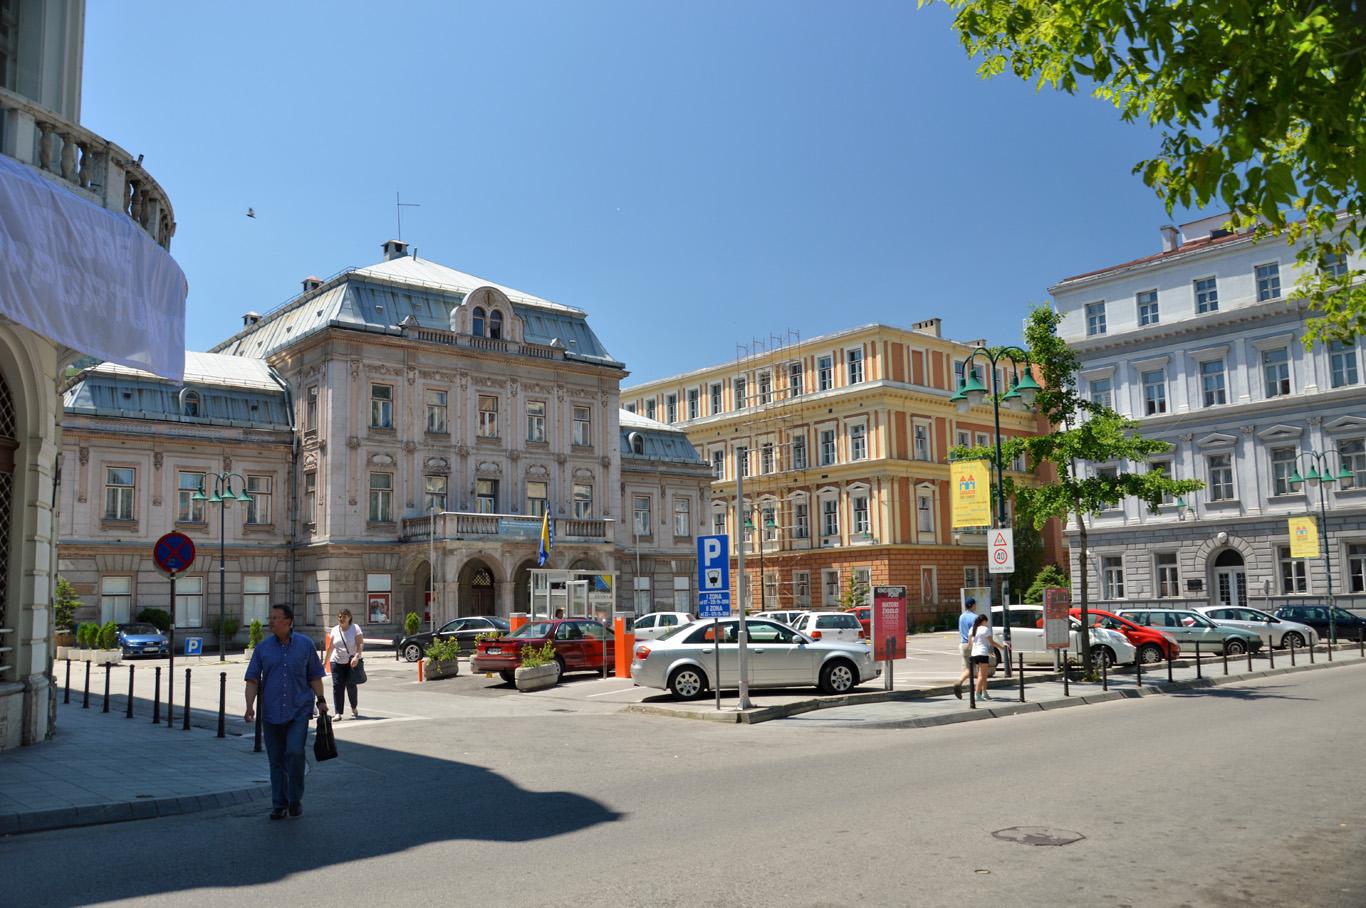 European style square